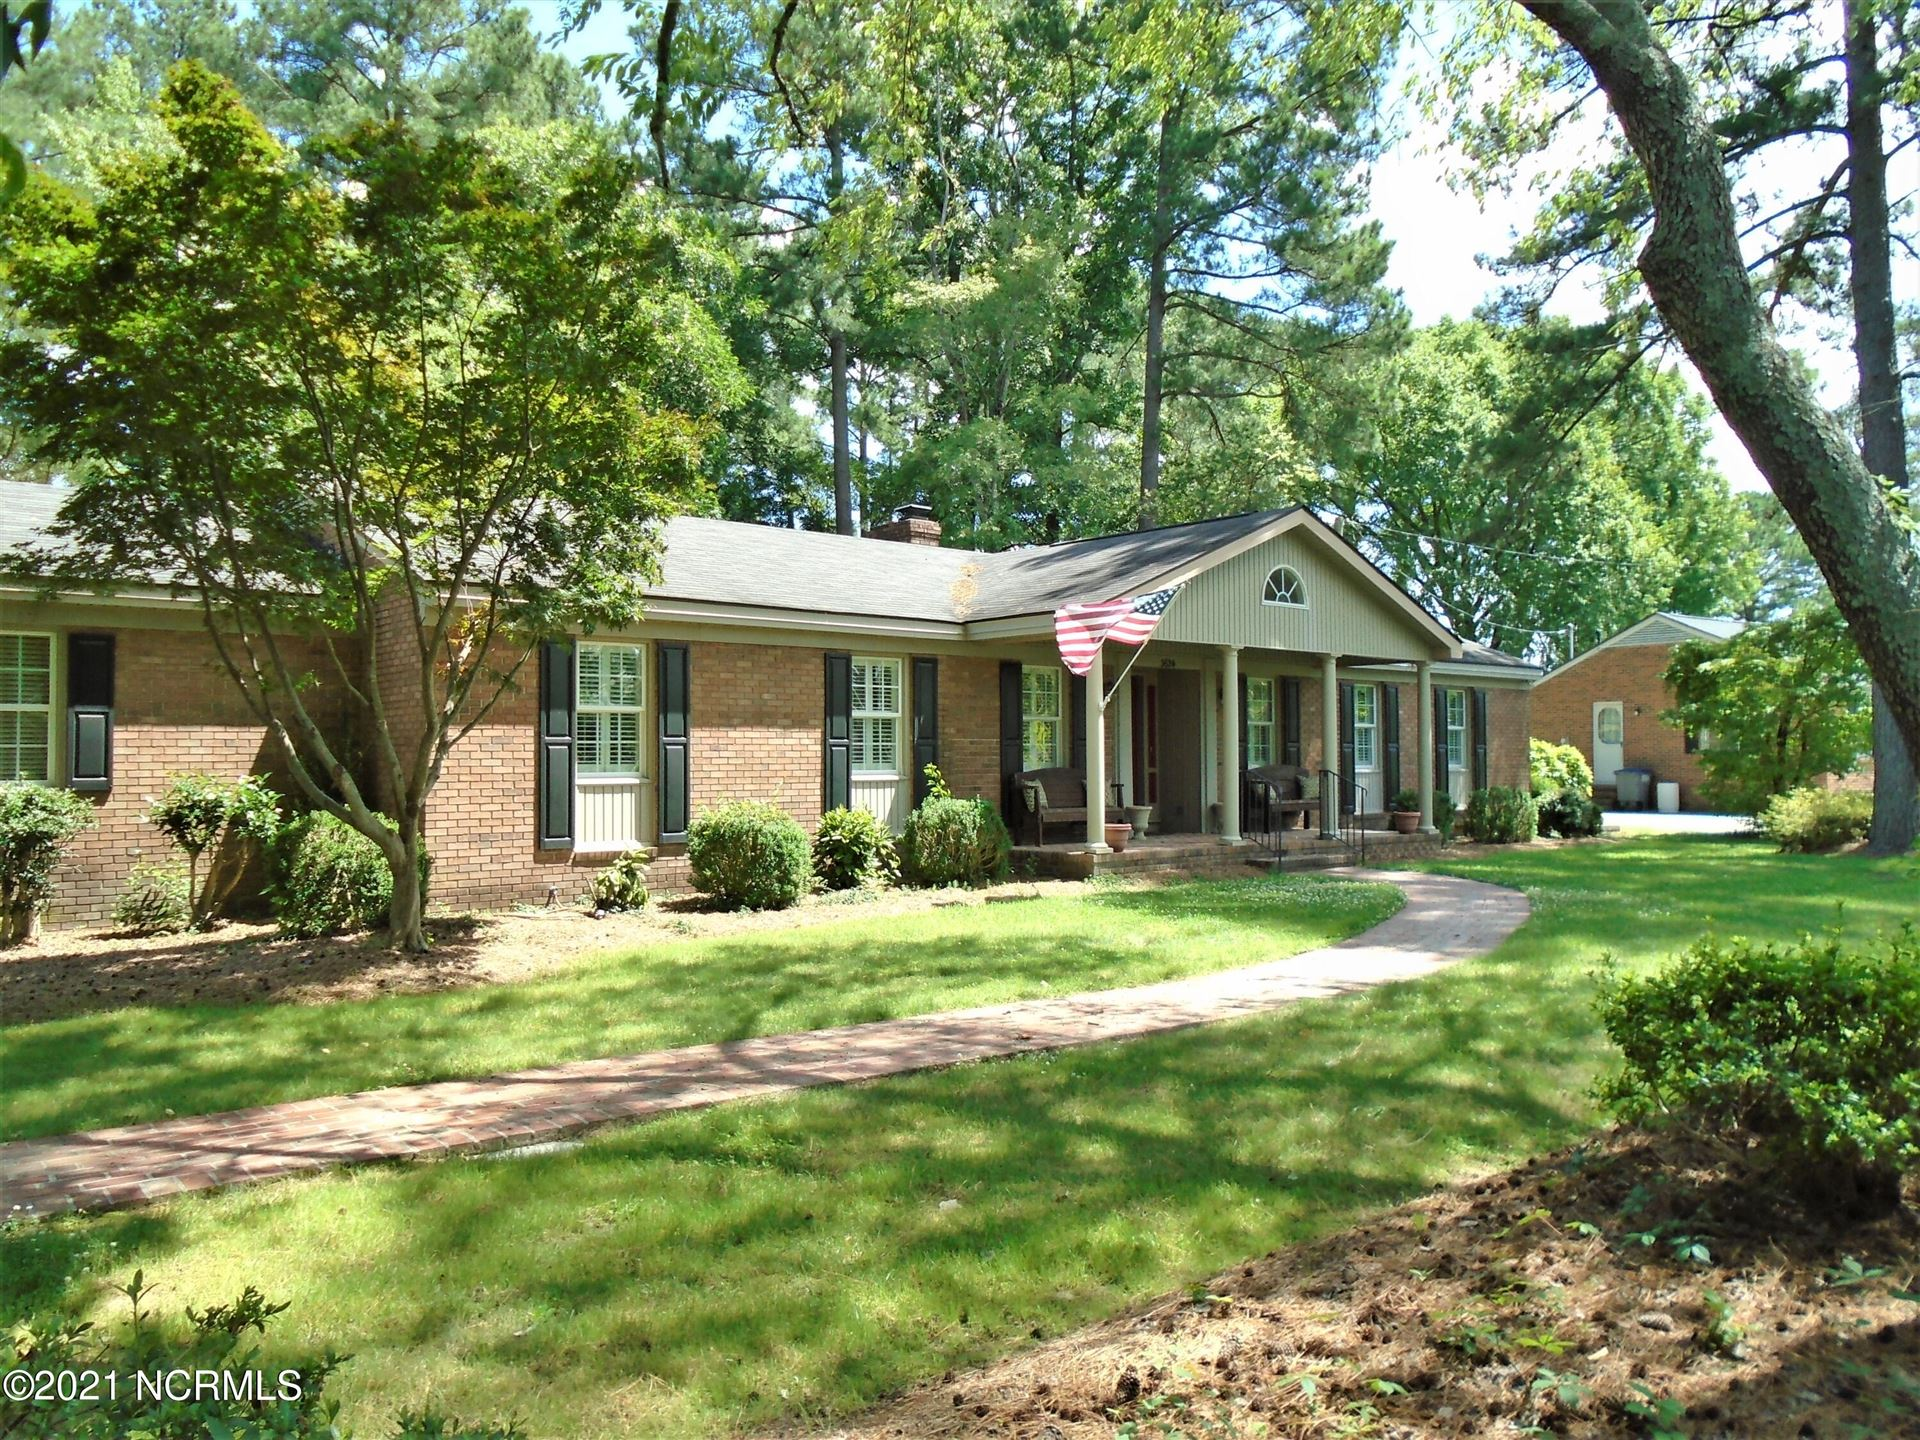 Photo of 3624 Colonial Lane, Rocky Mount, NC 27804 (MLS # 100280702)